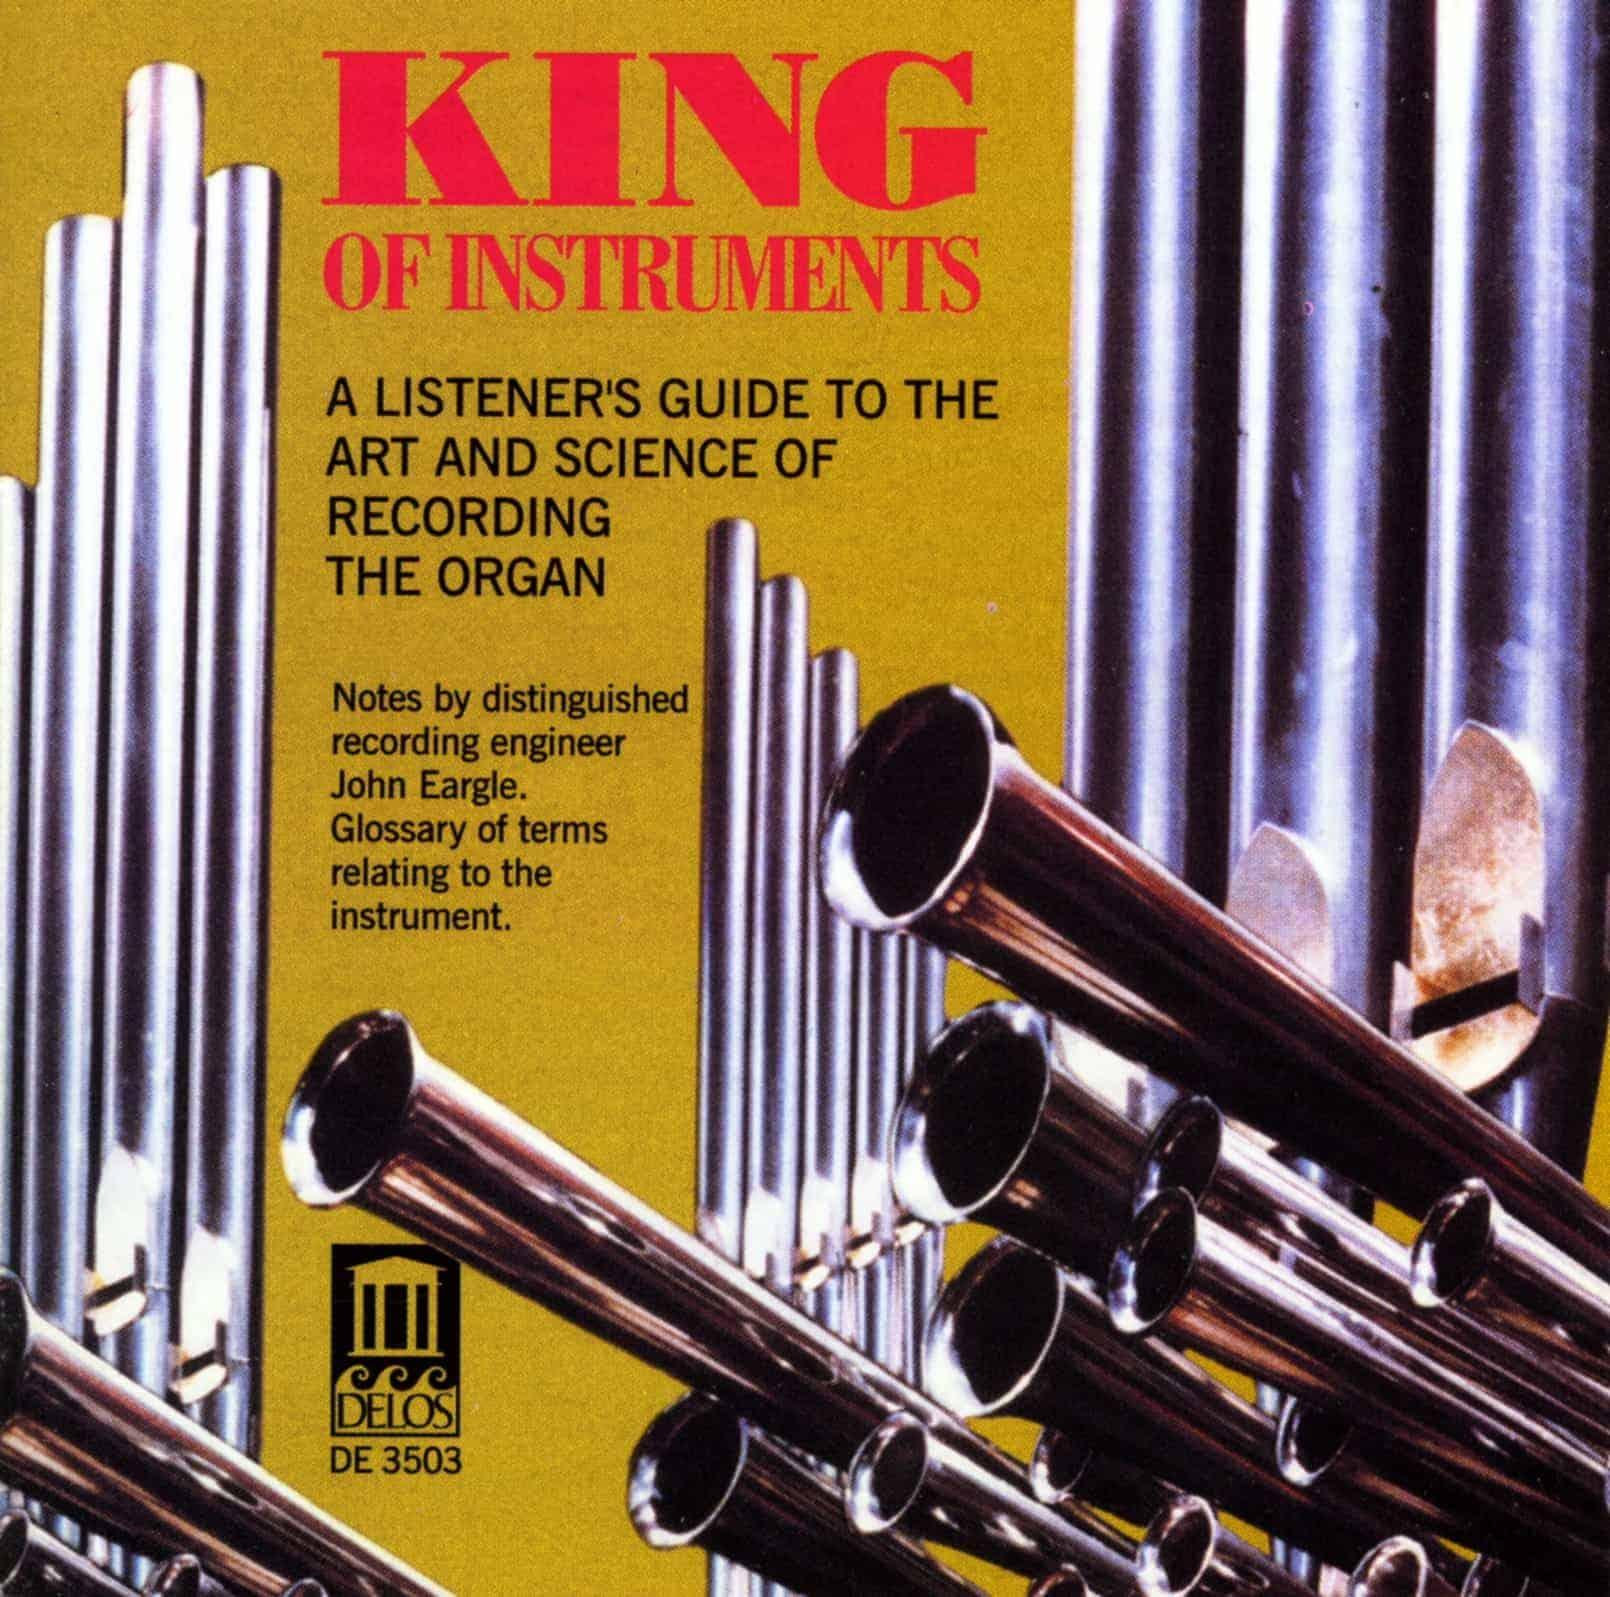 King of Instruments/Organ Sampler